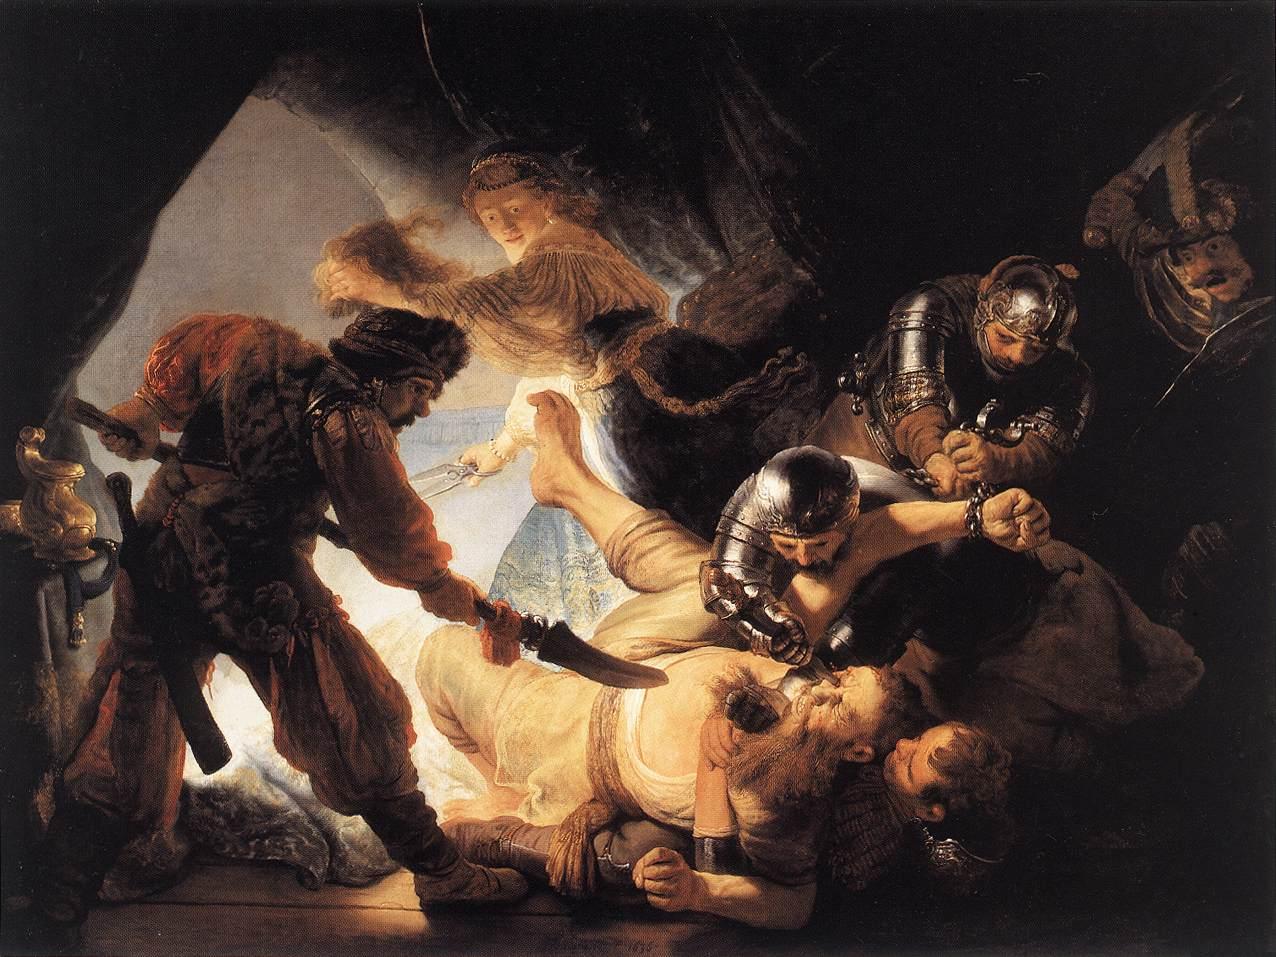 Ослепление Самсона. Рембрандт Харменс ван Рейн (1606-1669)